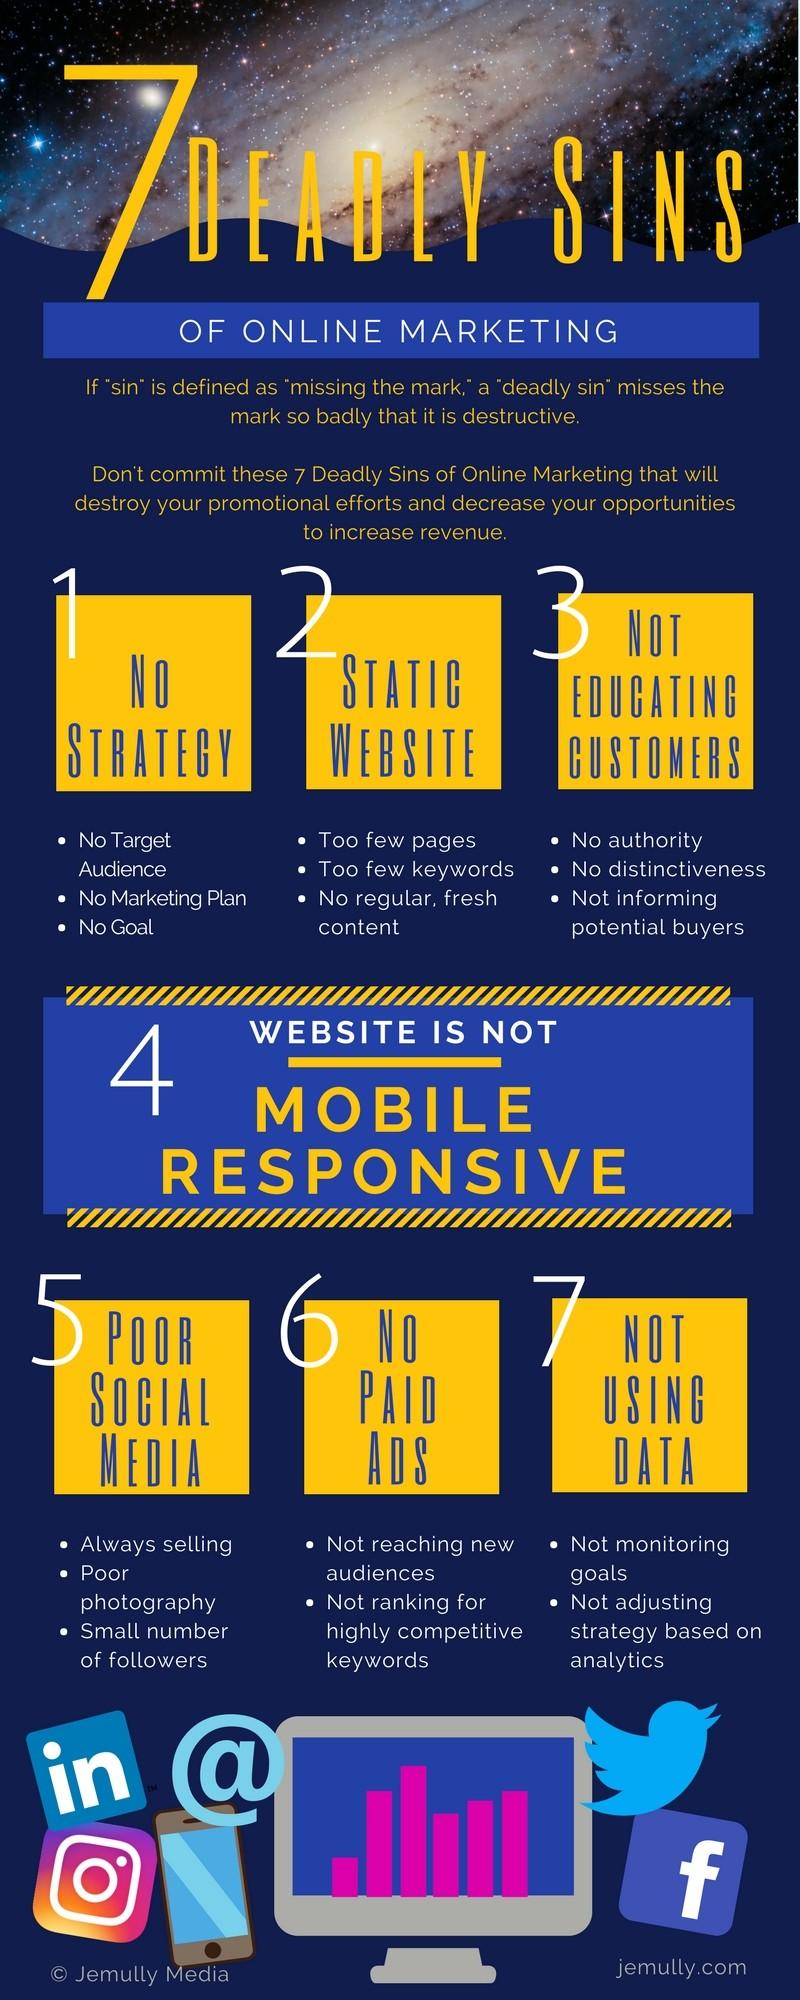 7 Deadly Sins of Online Marketing